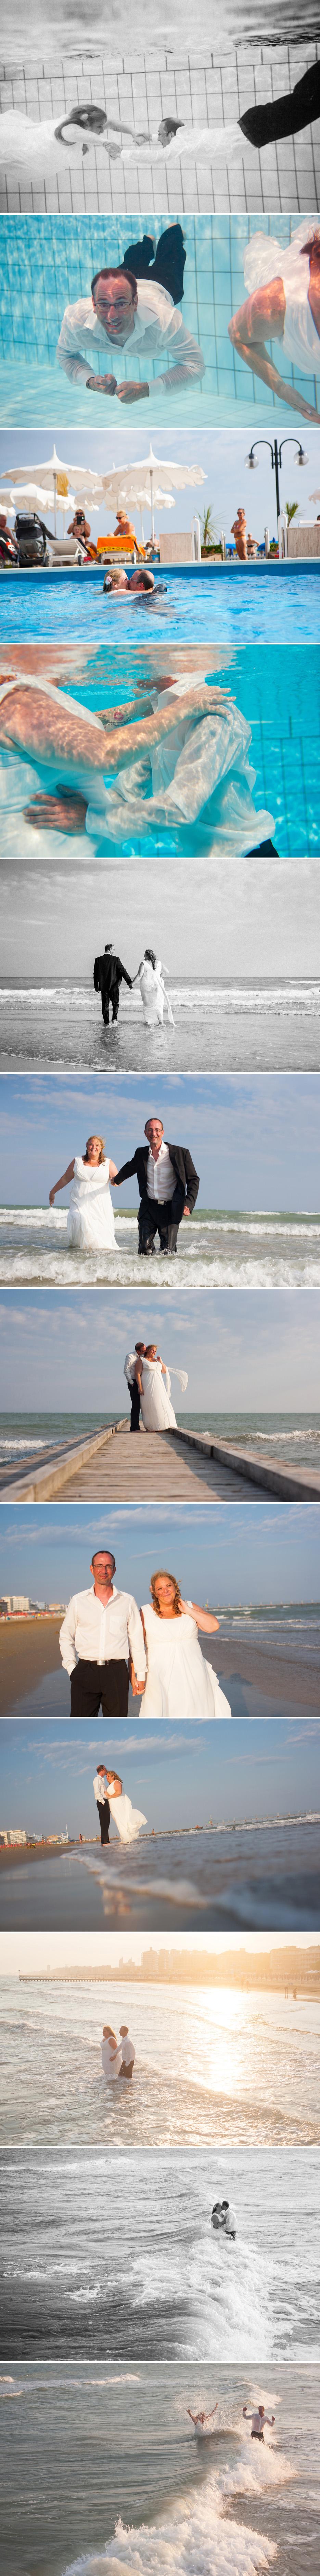 trash the dress venezia, servizio fotografico venezia. © Michele Agostinis